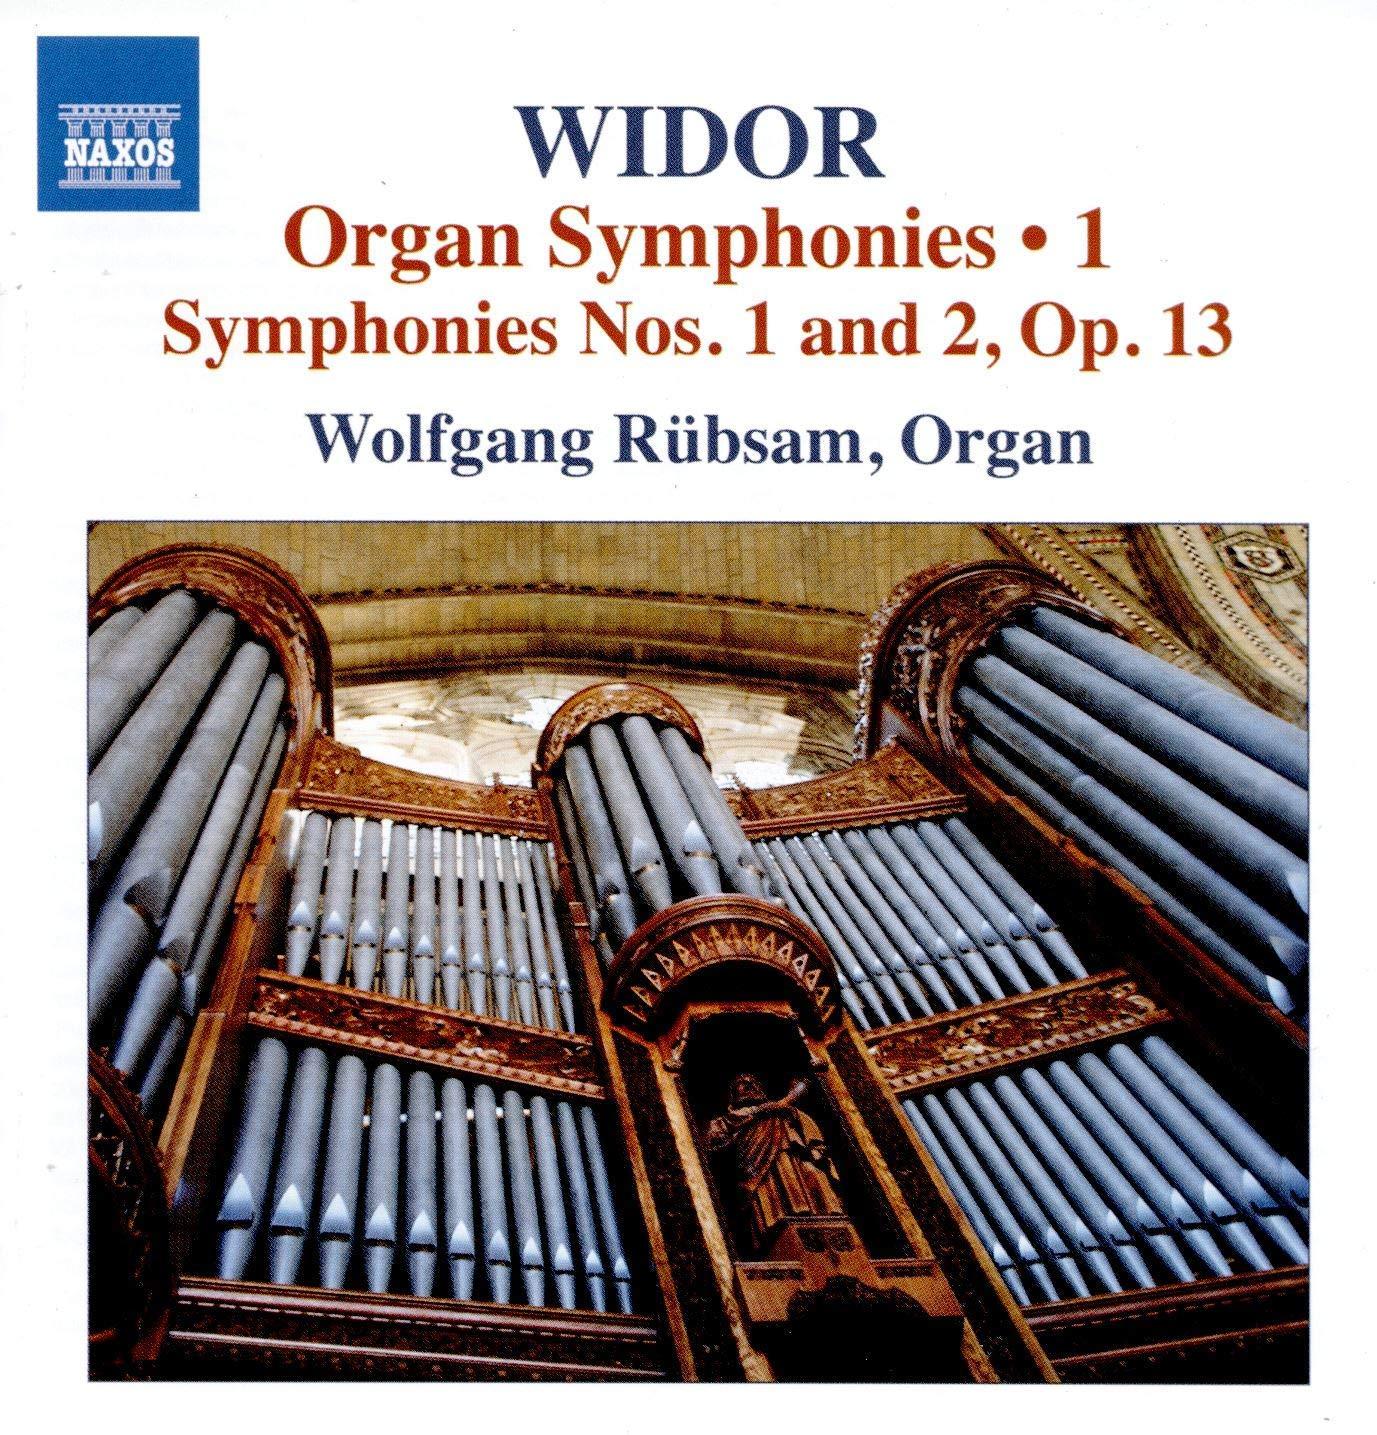 8 574161. WIDOR Organ Symphonies Vol 1 – Nos 1 & 2 (Wolfgang Rübsam)